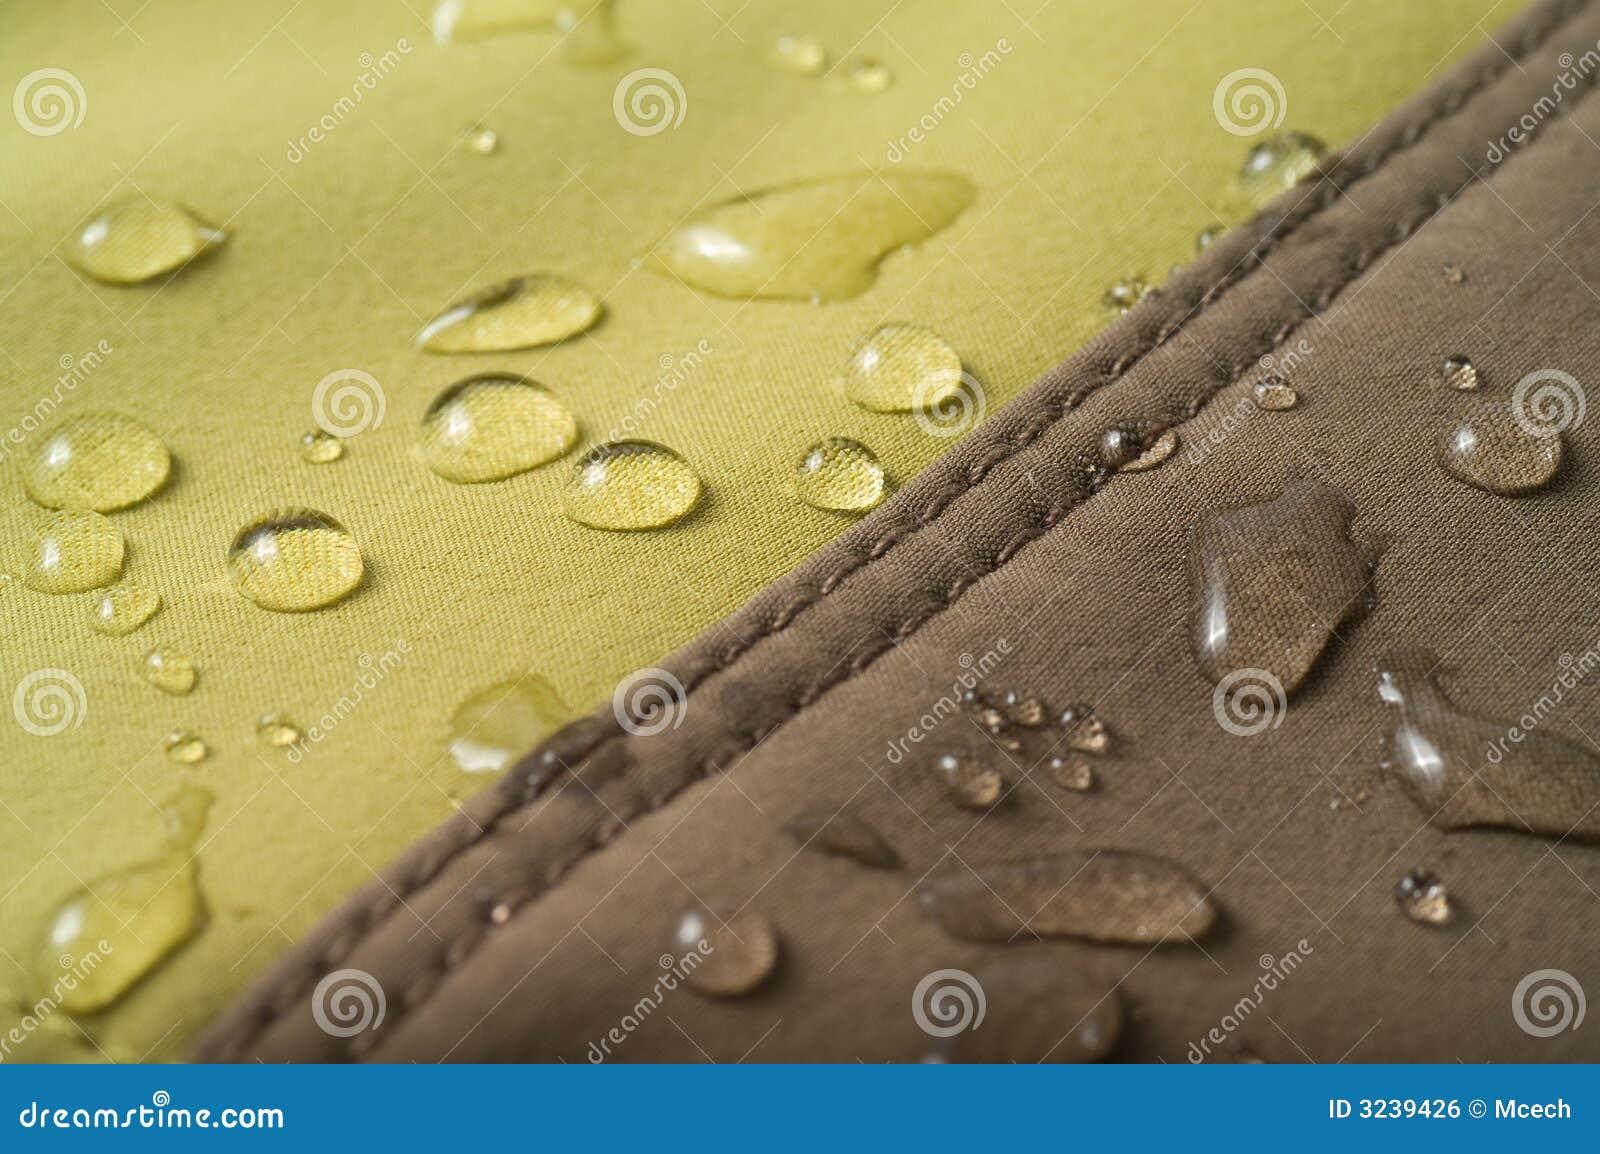 The waterproof fabric